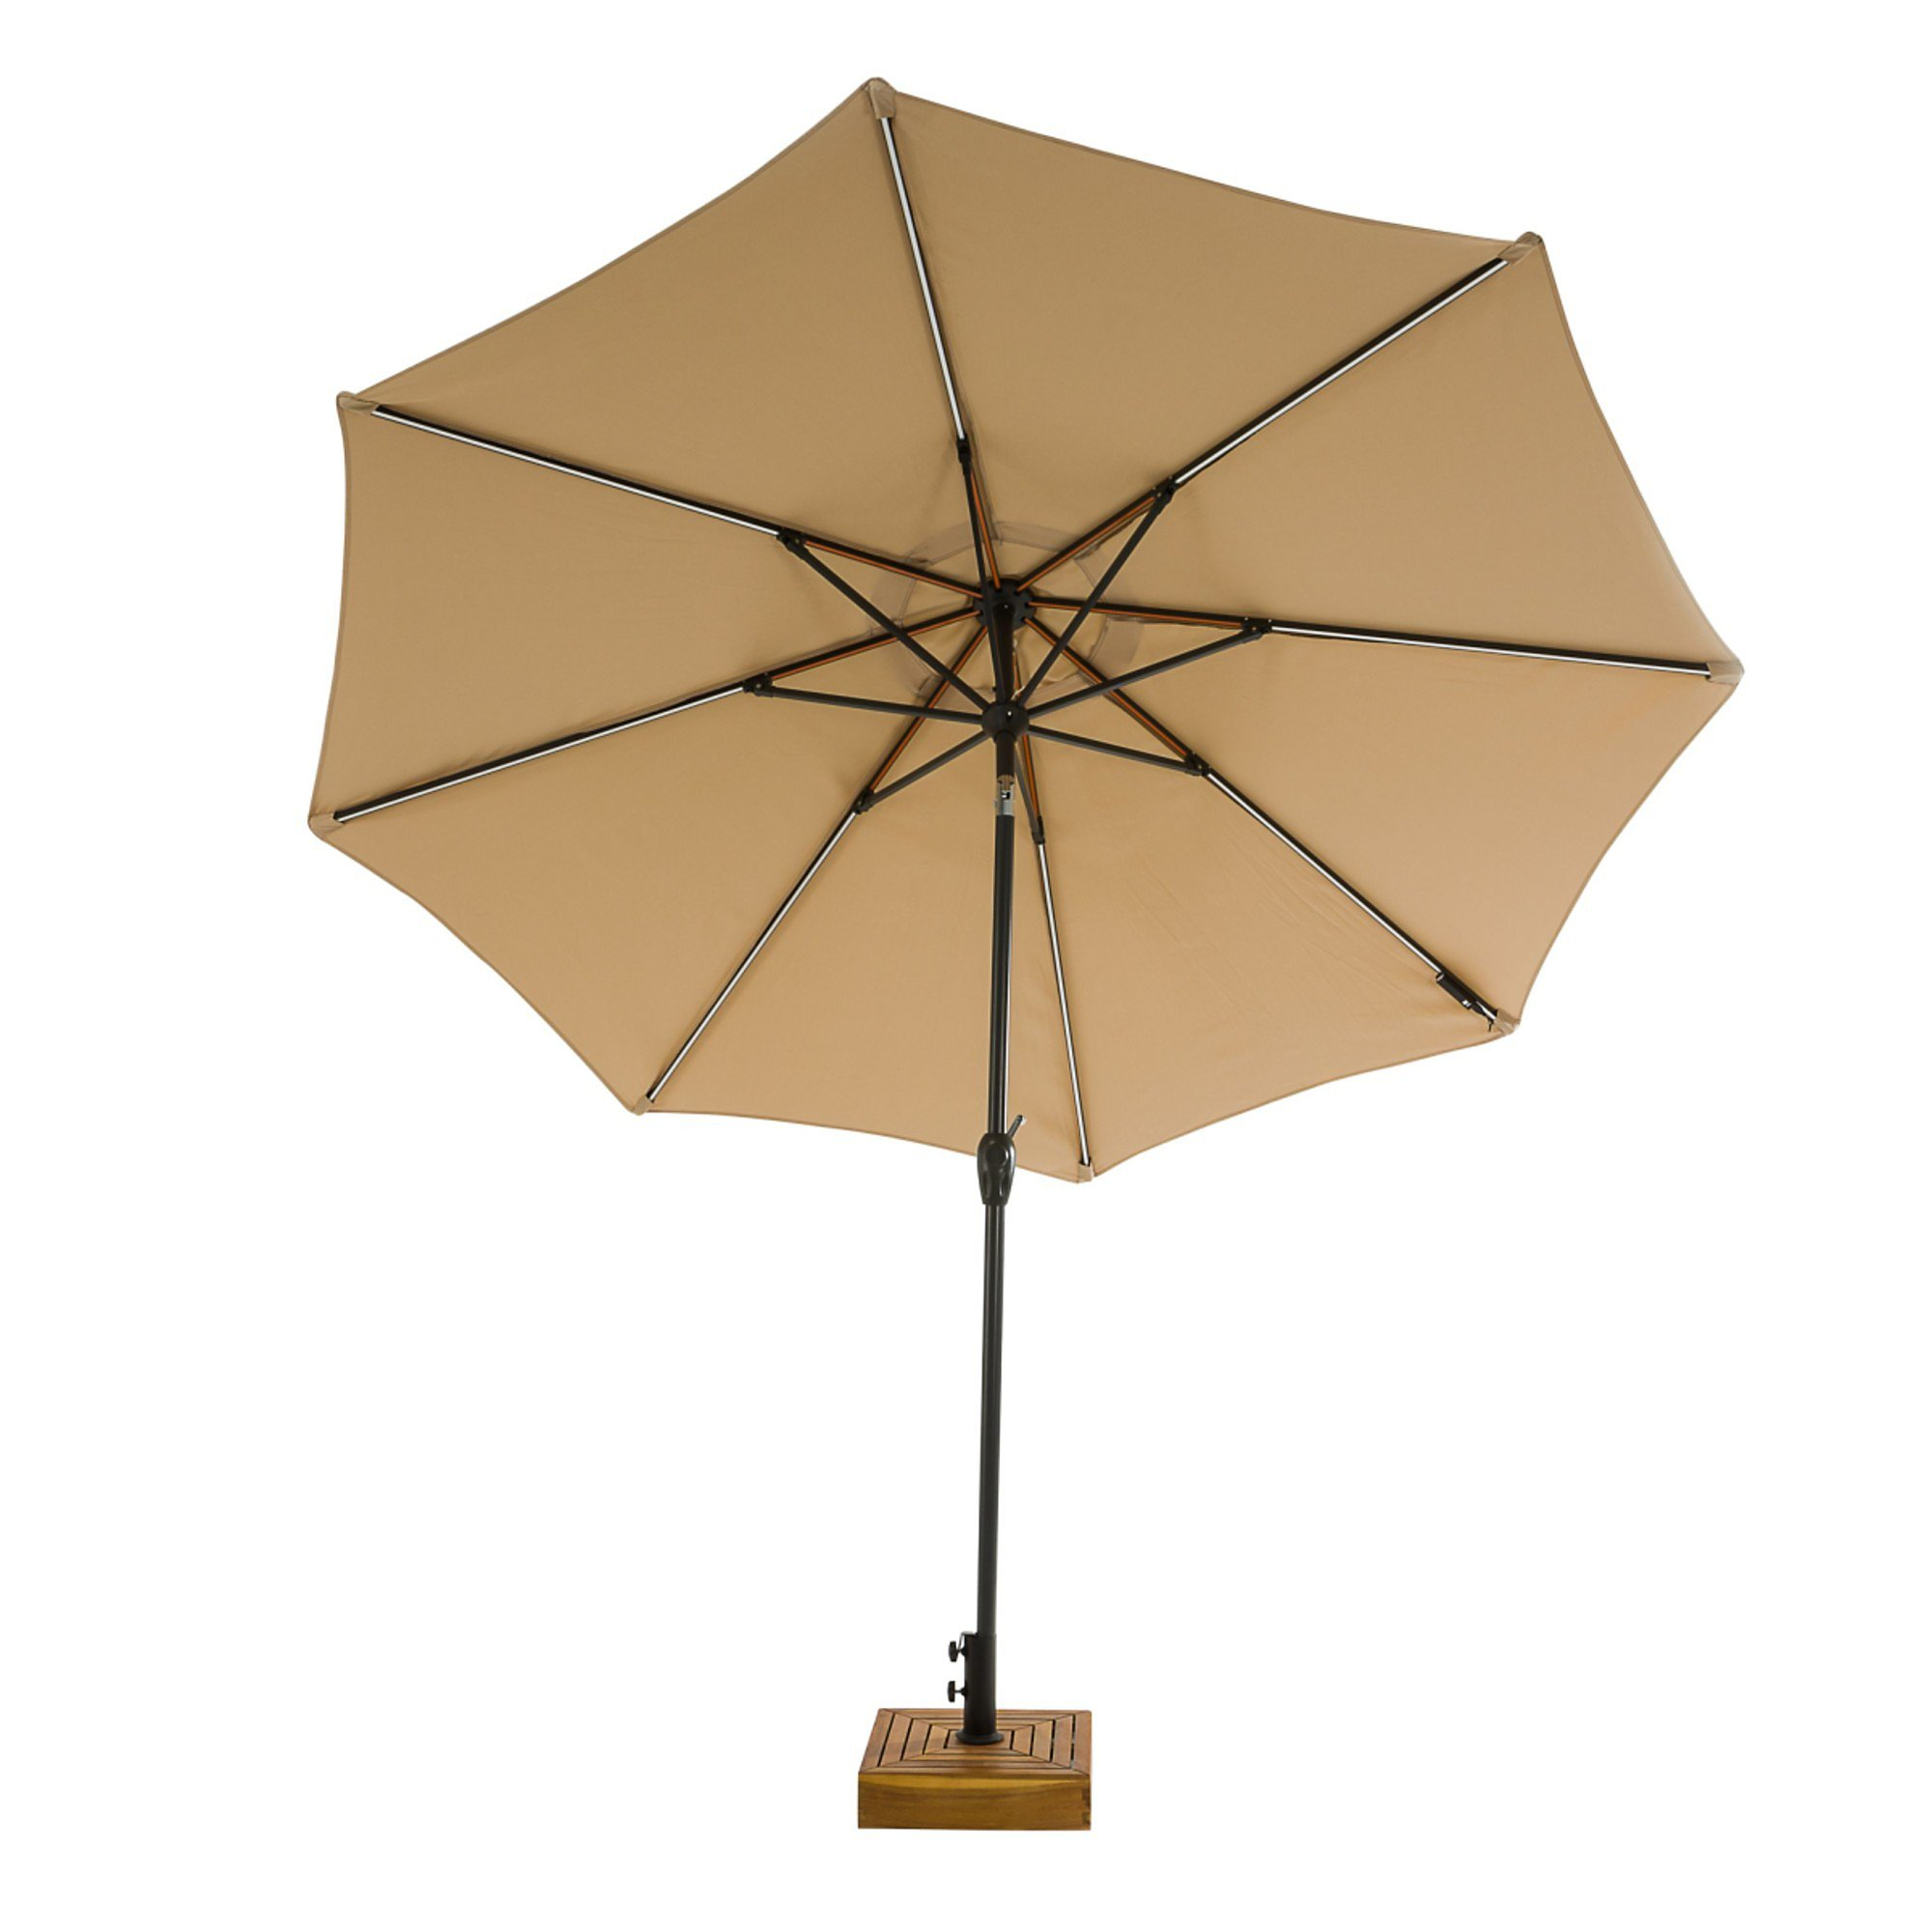 Sonnenschirm Mit Led Beleuchtung Beige Bestellen Weltbild De